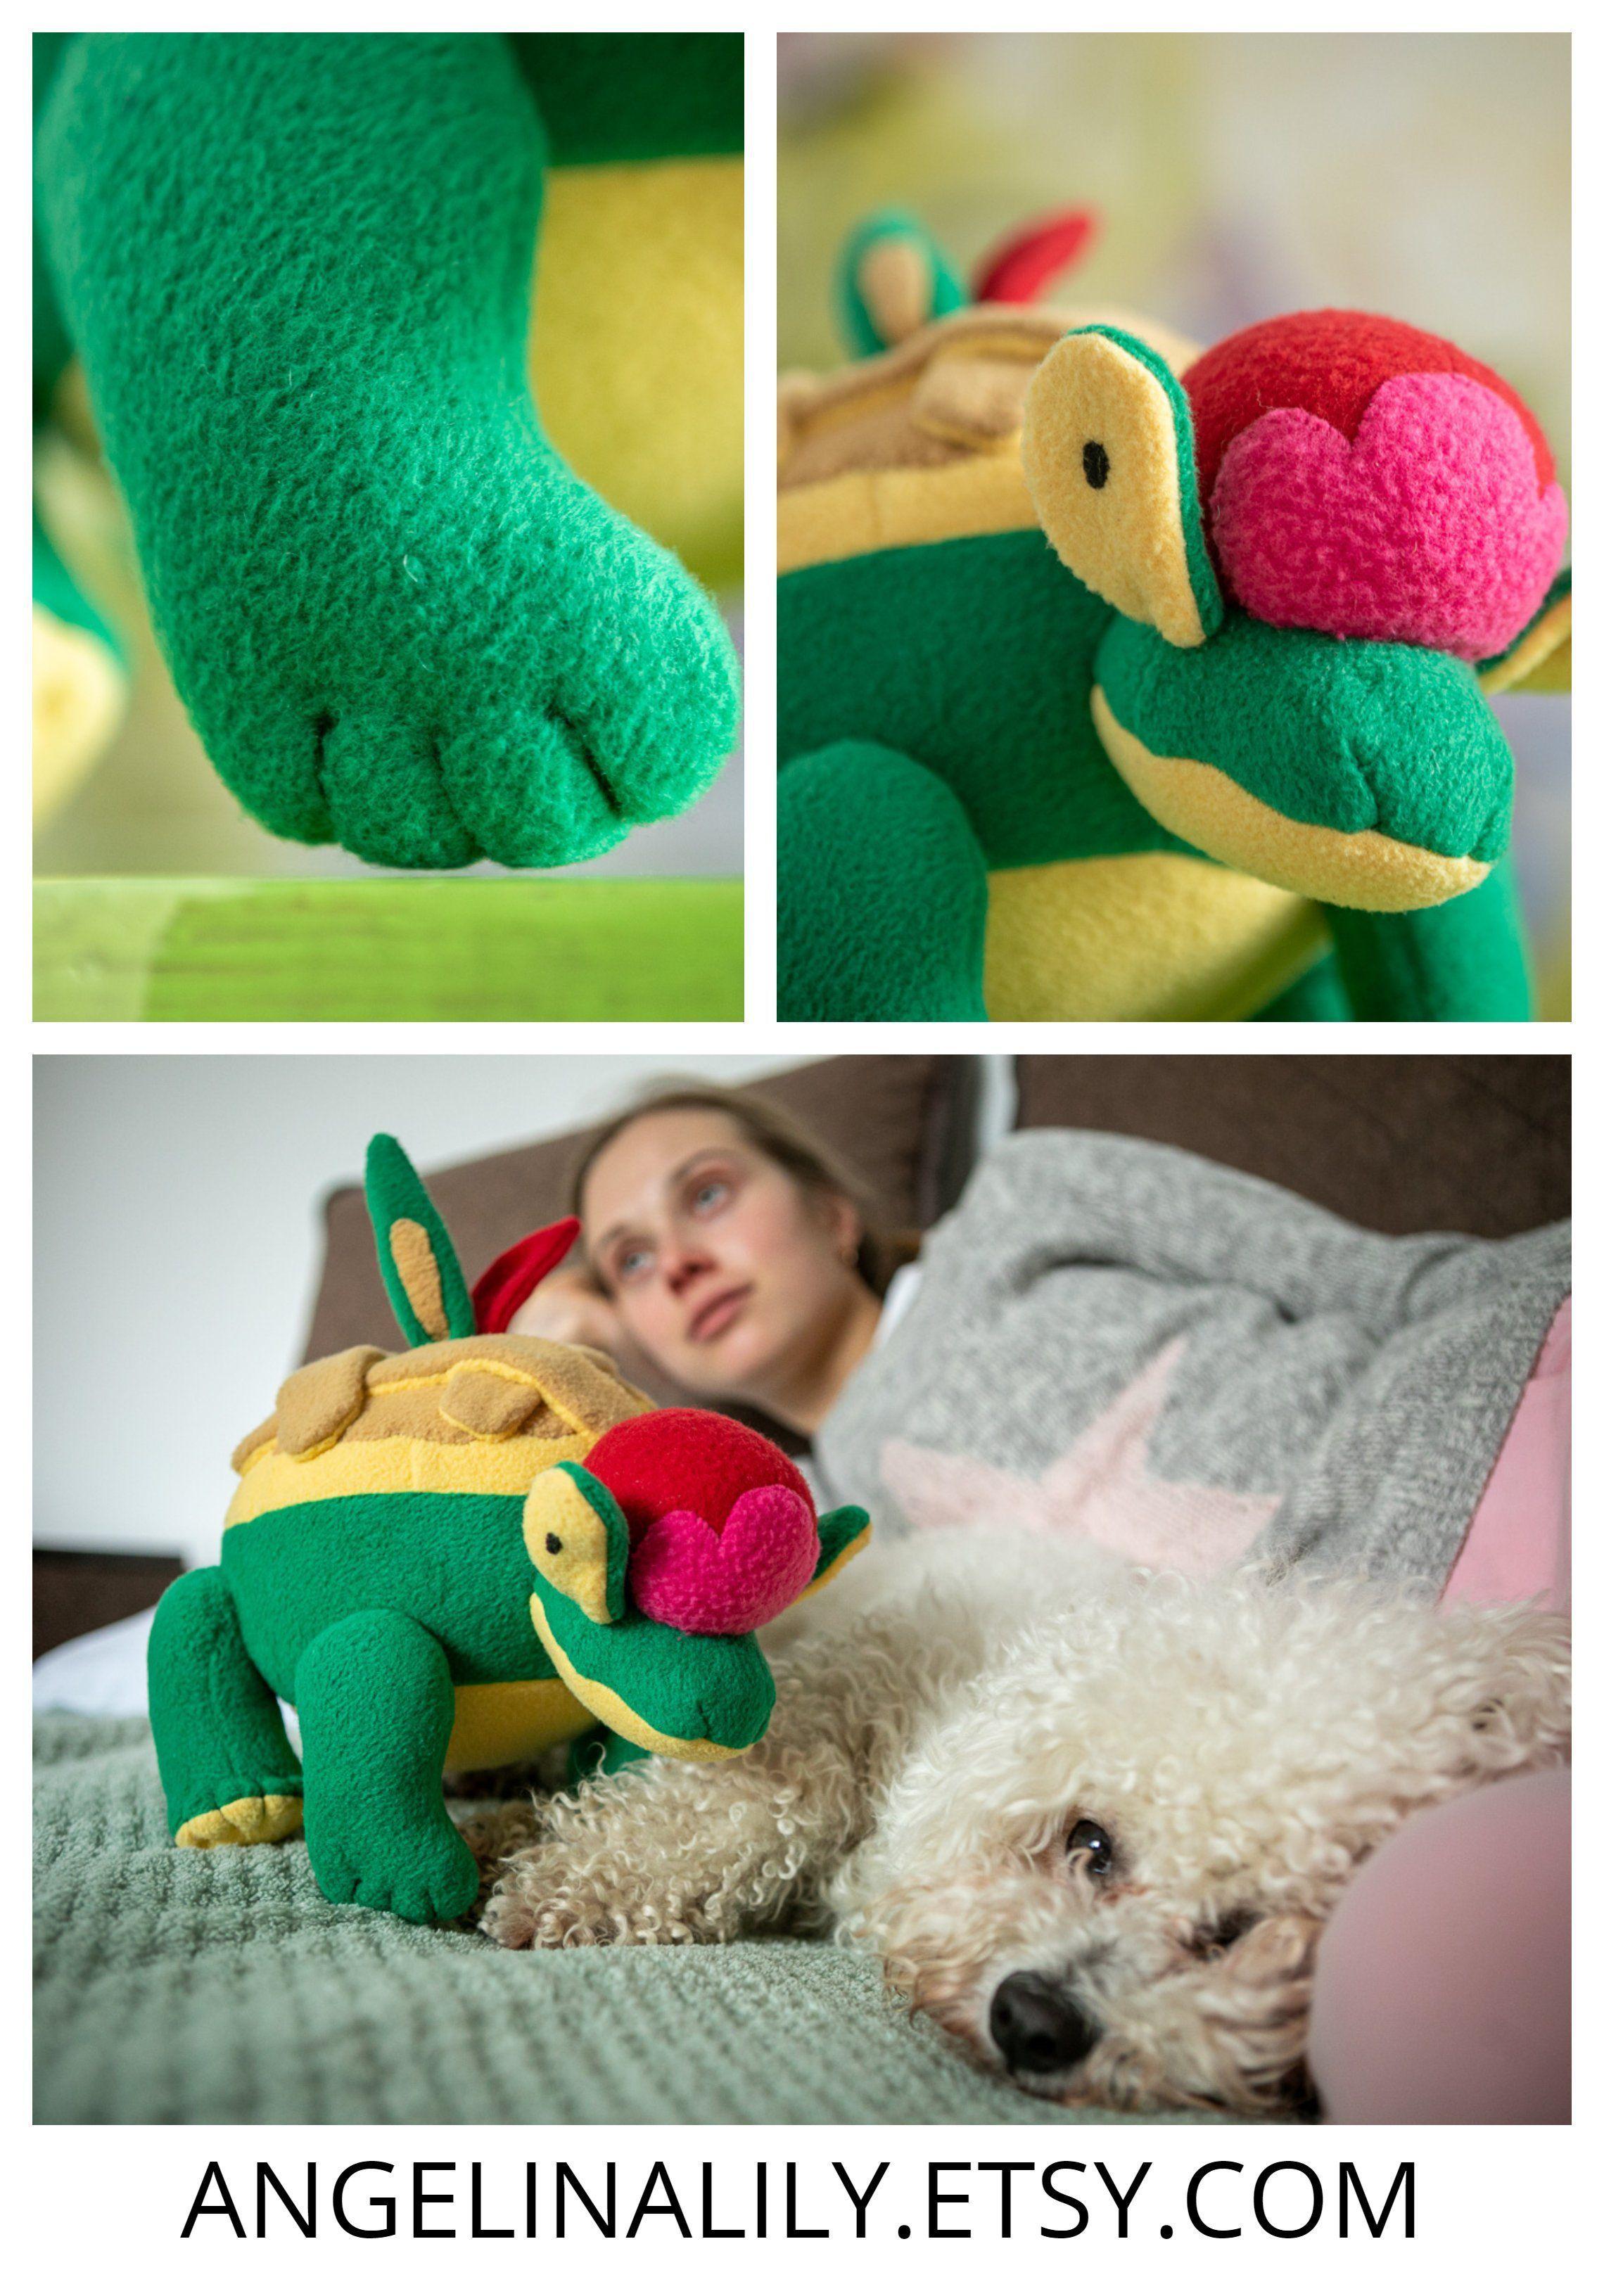 Details about  /Shiny Appletun plush Green Appleton pokemon Handmade toy